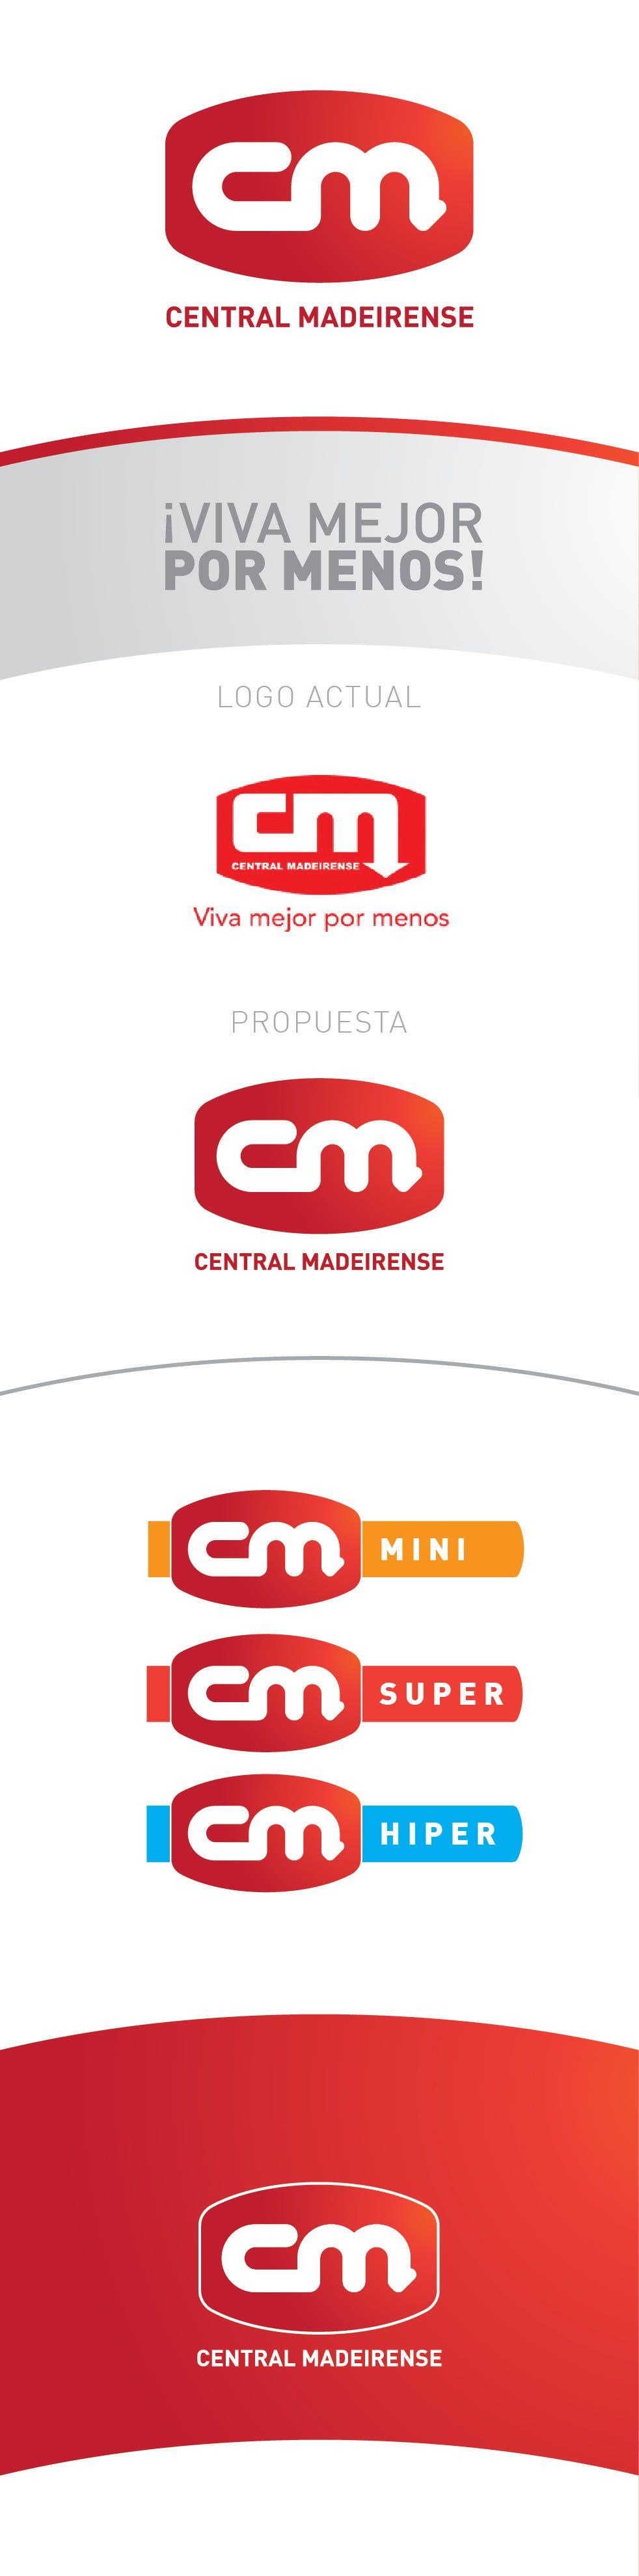 Central Madeirense - Rebranding experiment